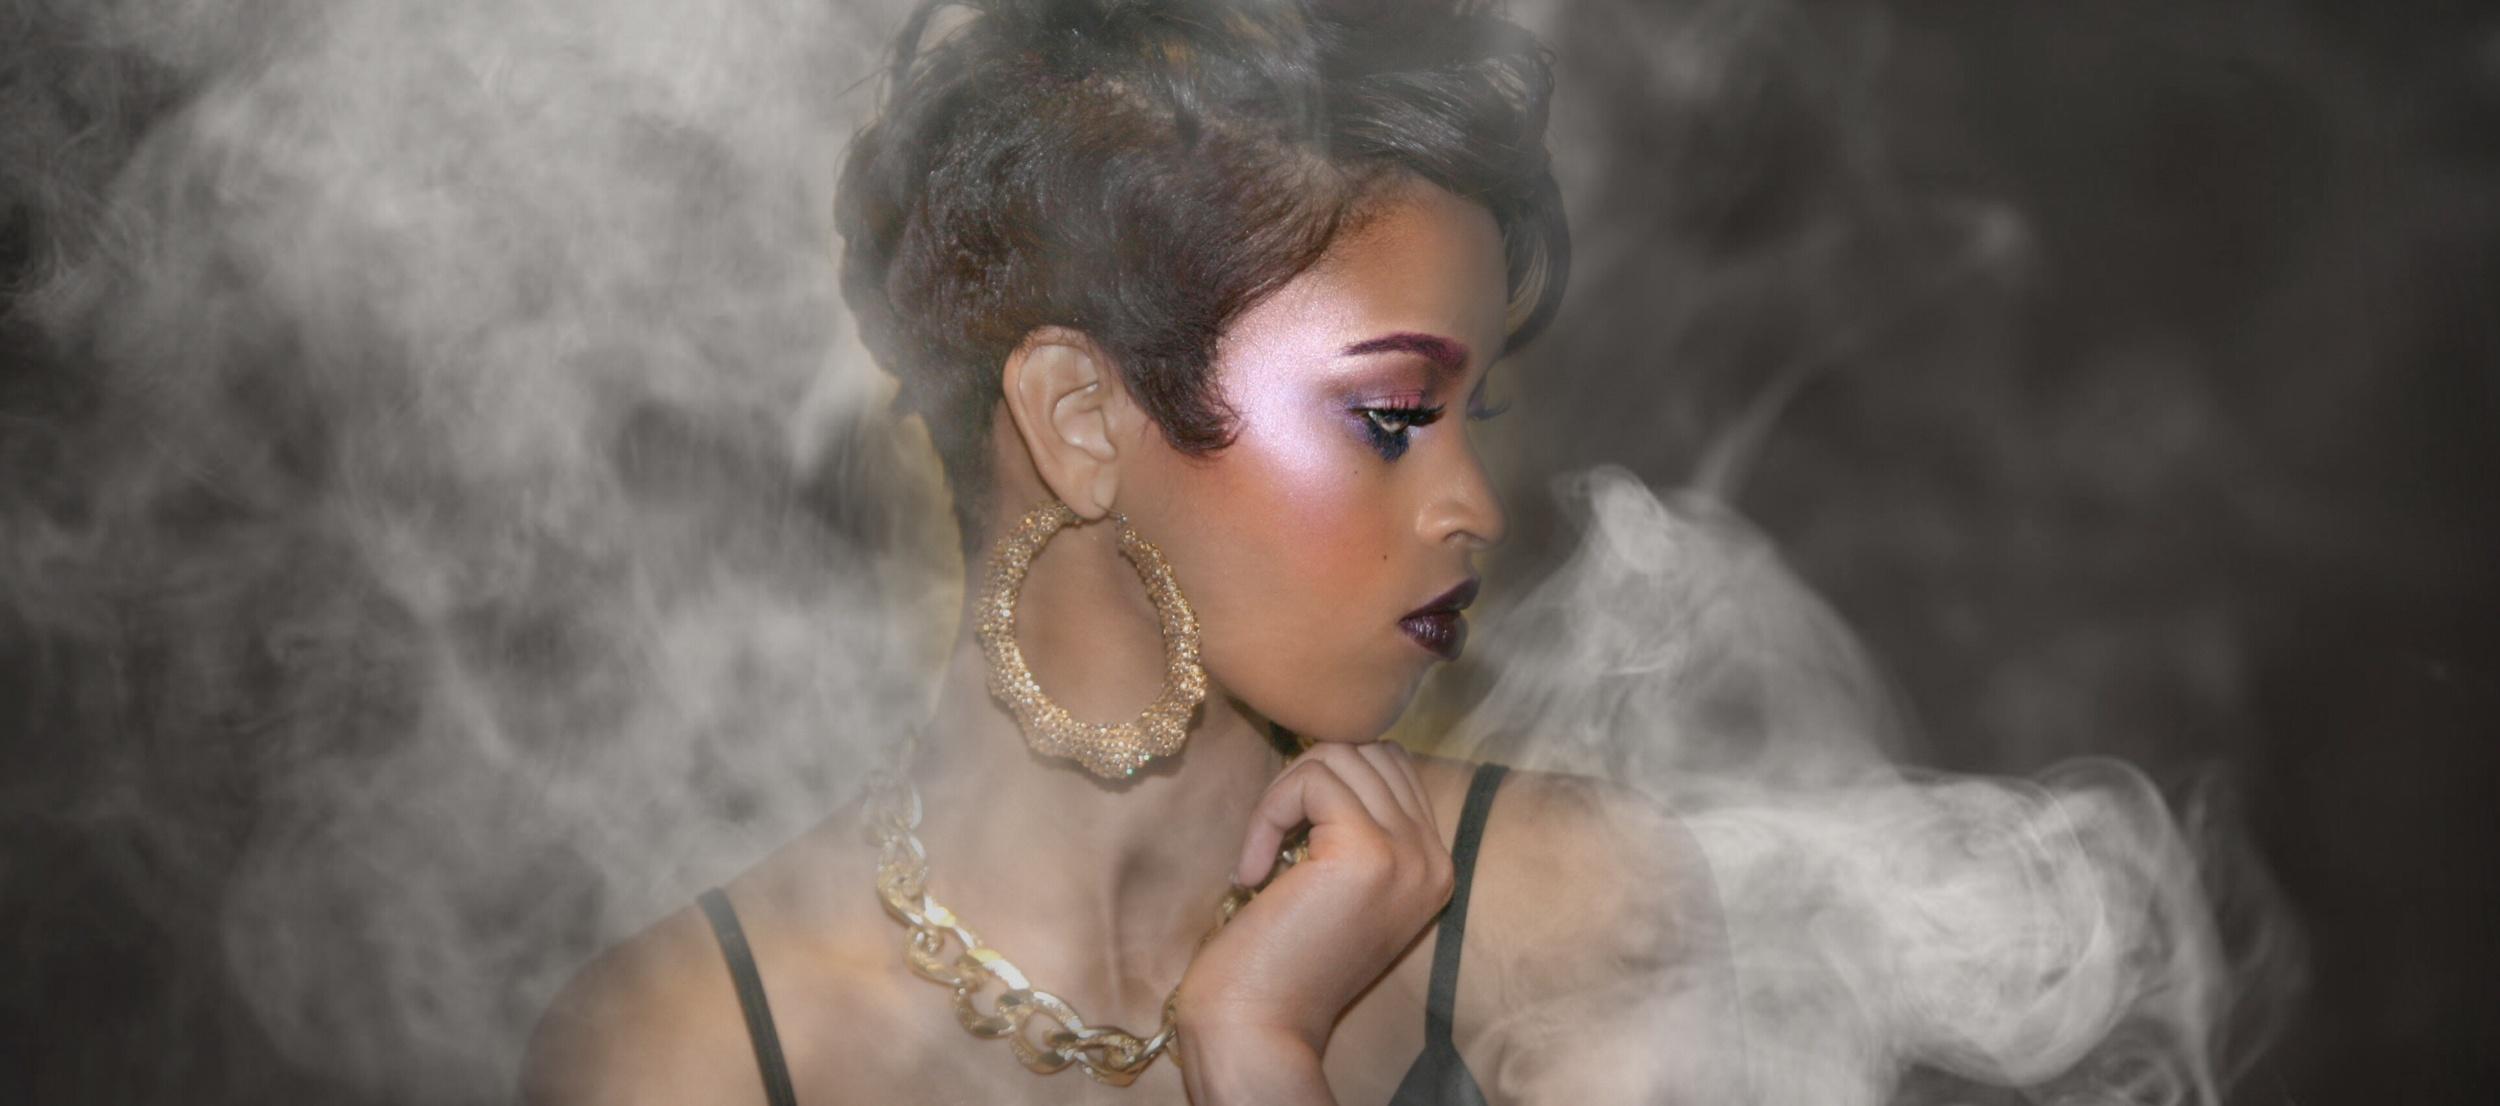 Tymia Yvette | Editorial Photo Shoot | Baltimore Maryland Makeup Artist